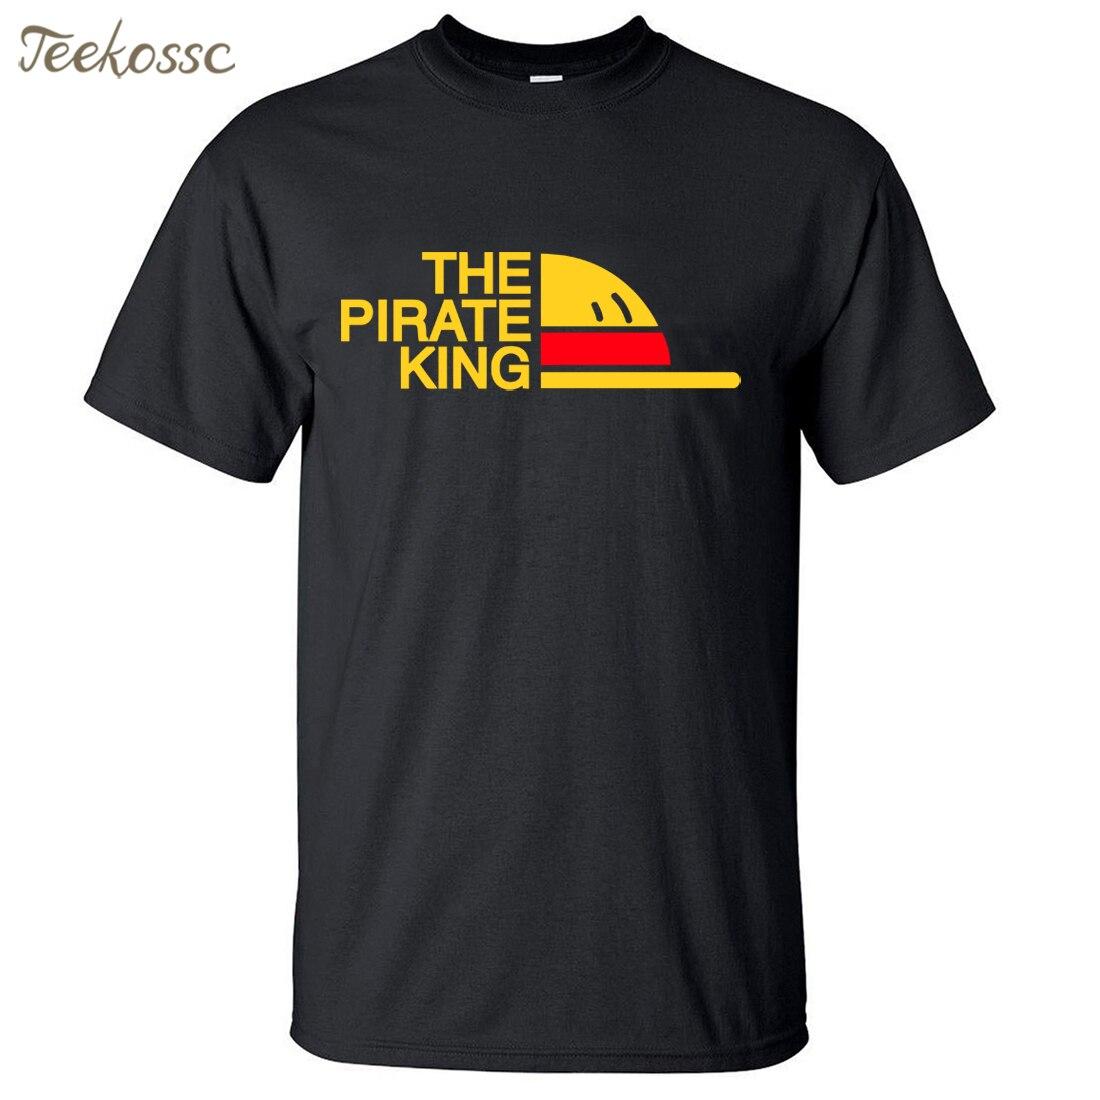 New Brand One Piece T-Shirt Men The Pirate King T Shirt Mens Luffy Tshirt Summer Tees Japanese Anime Cotton Short Sleeve Men's